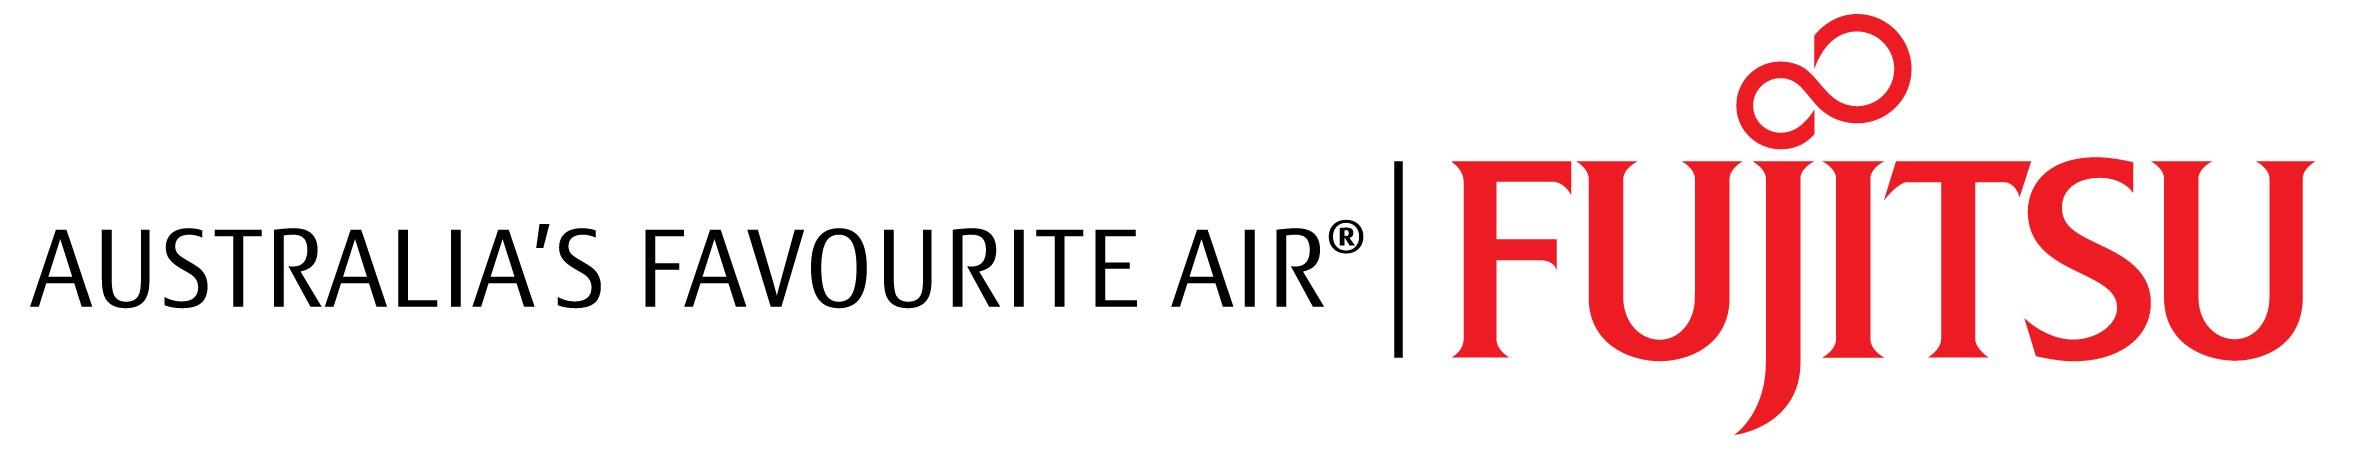 Australia's Favourite Air